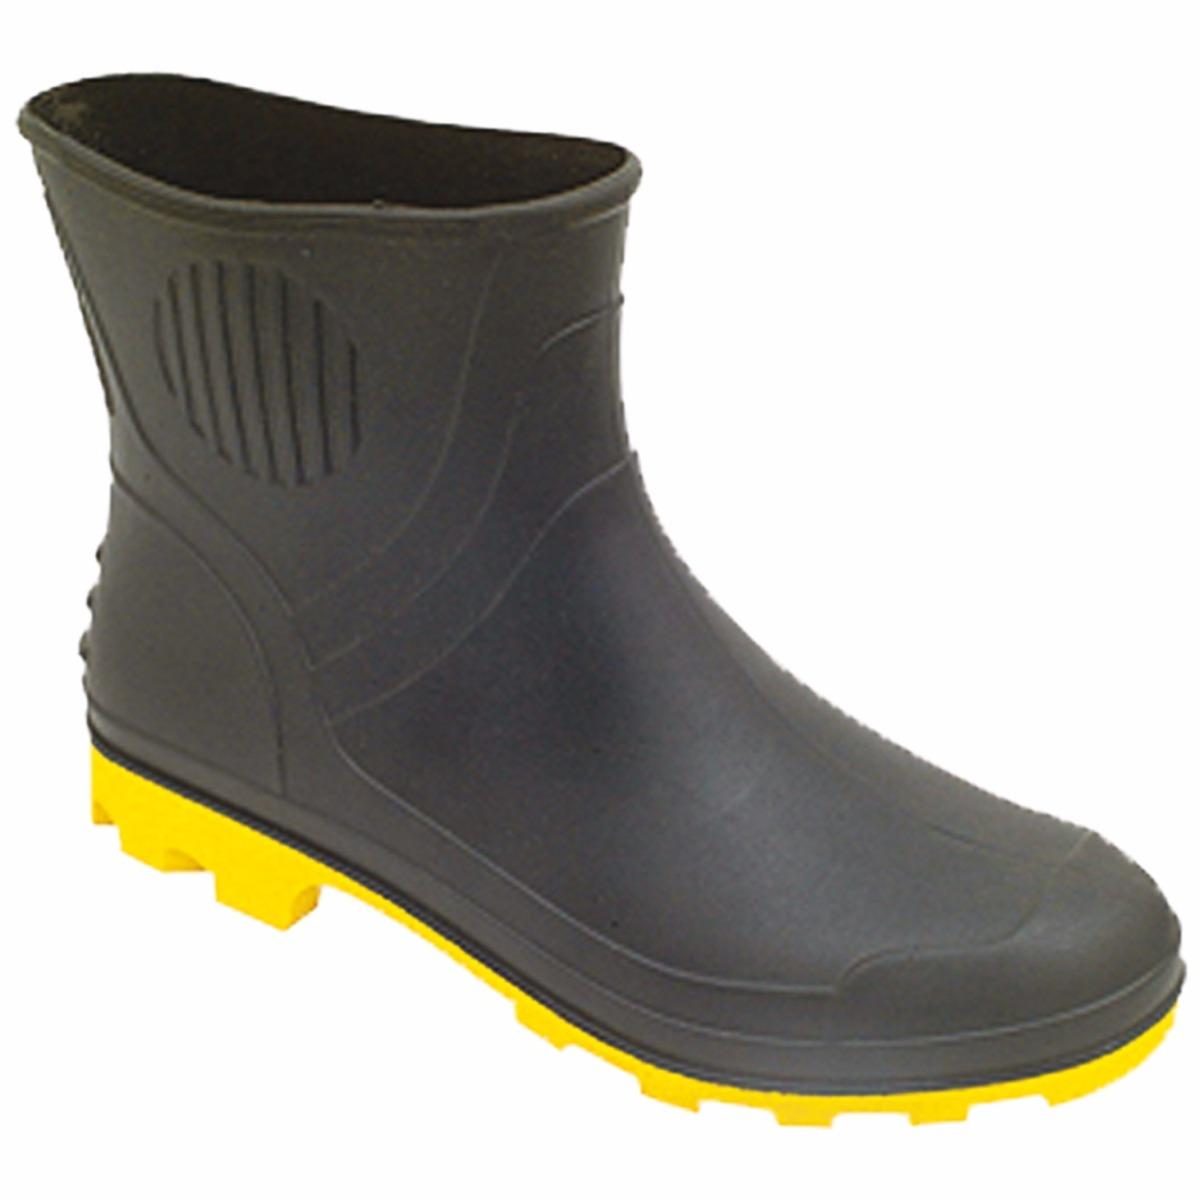 18844cd6746 3 galocha de chuva bota de borracha pvc cano curto prt. Carregando zoom.